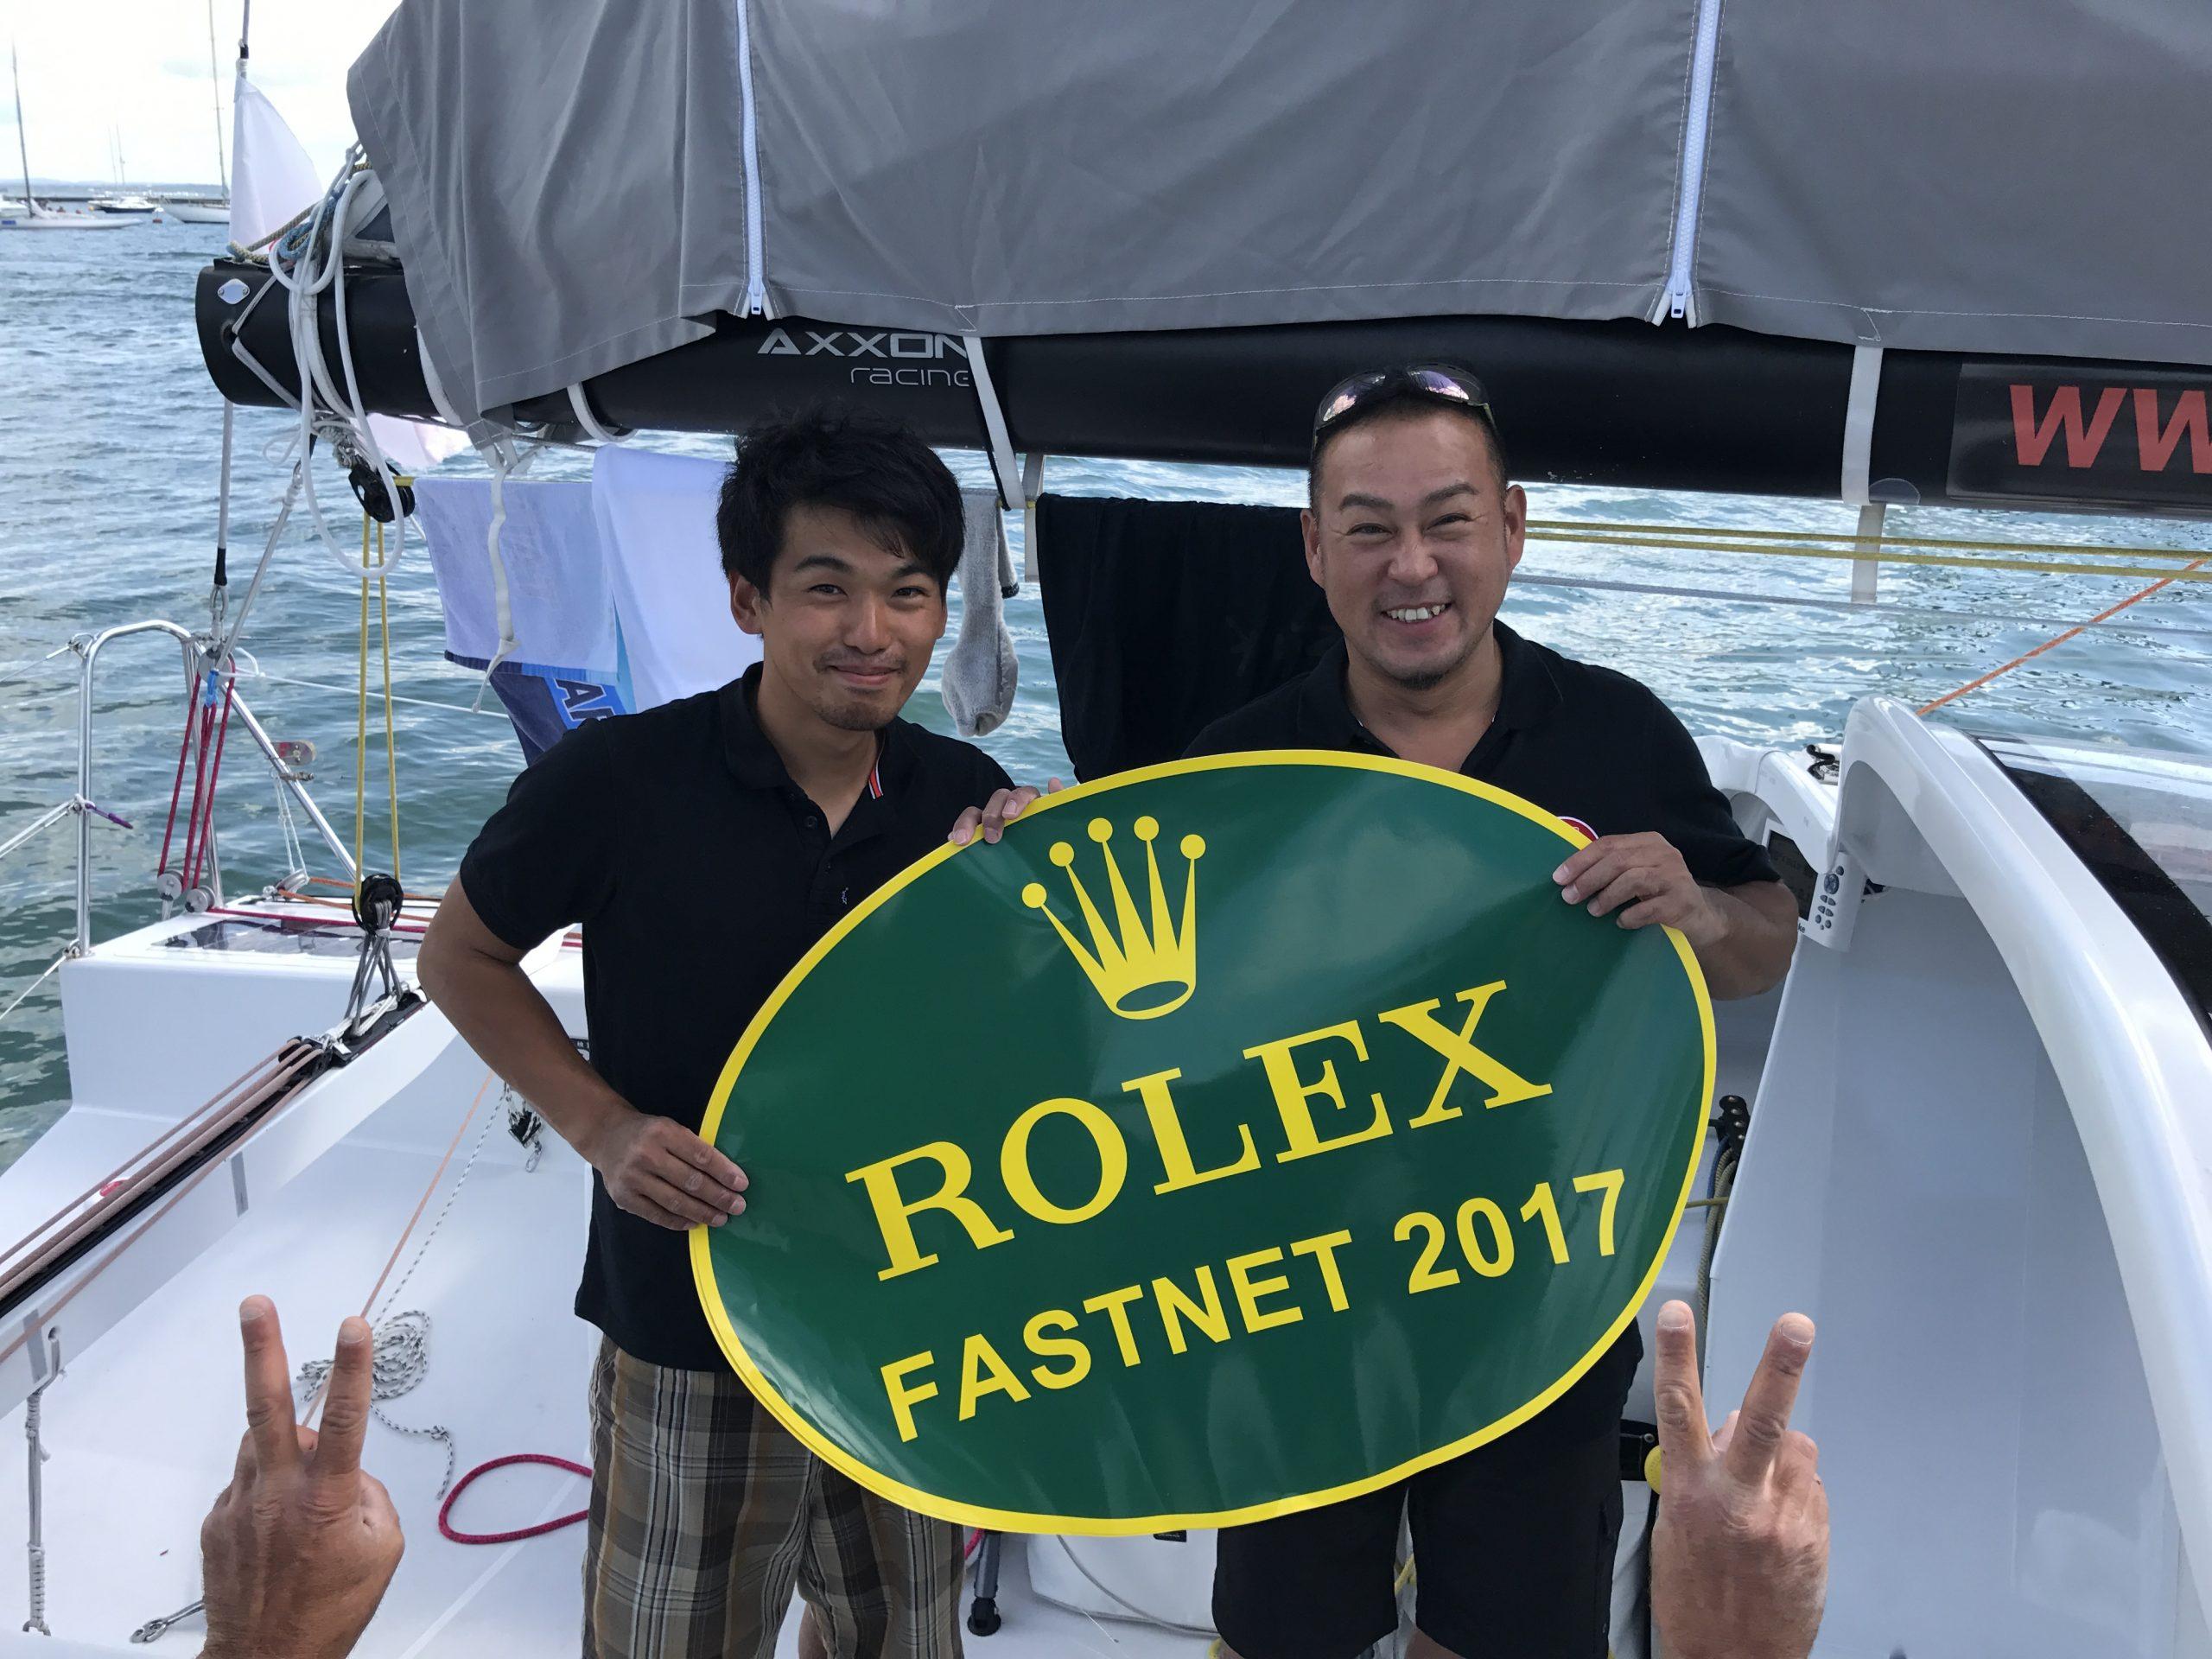 ROLEX FASTNET 2017